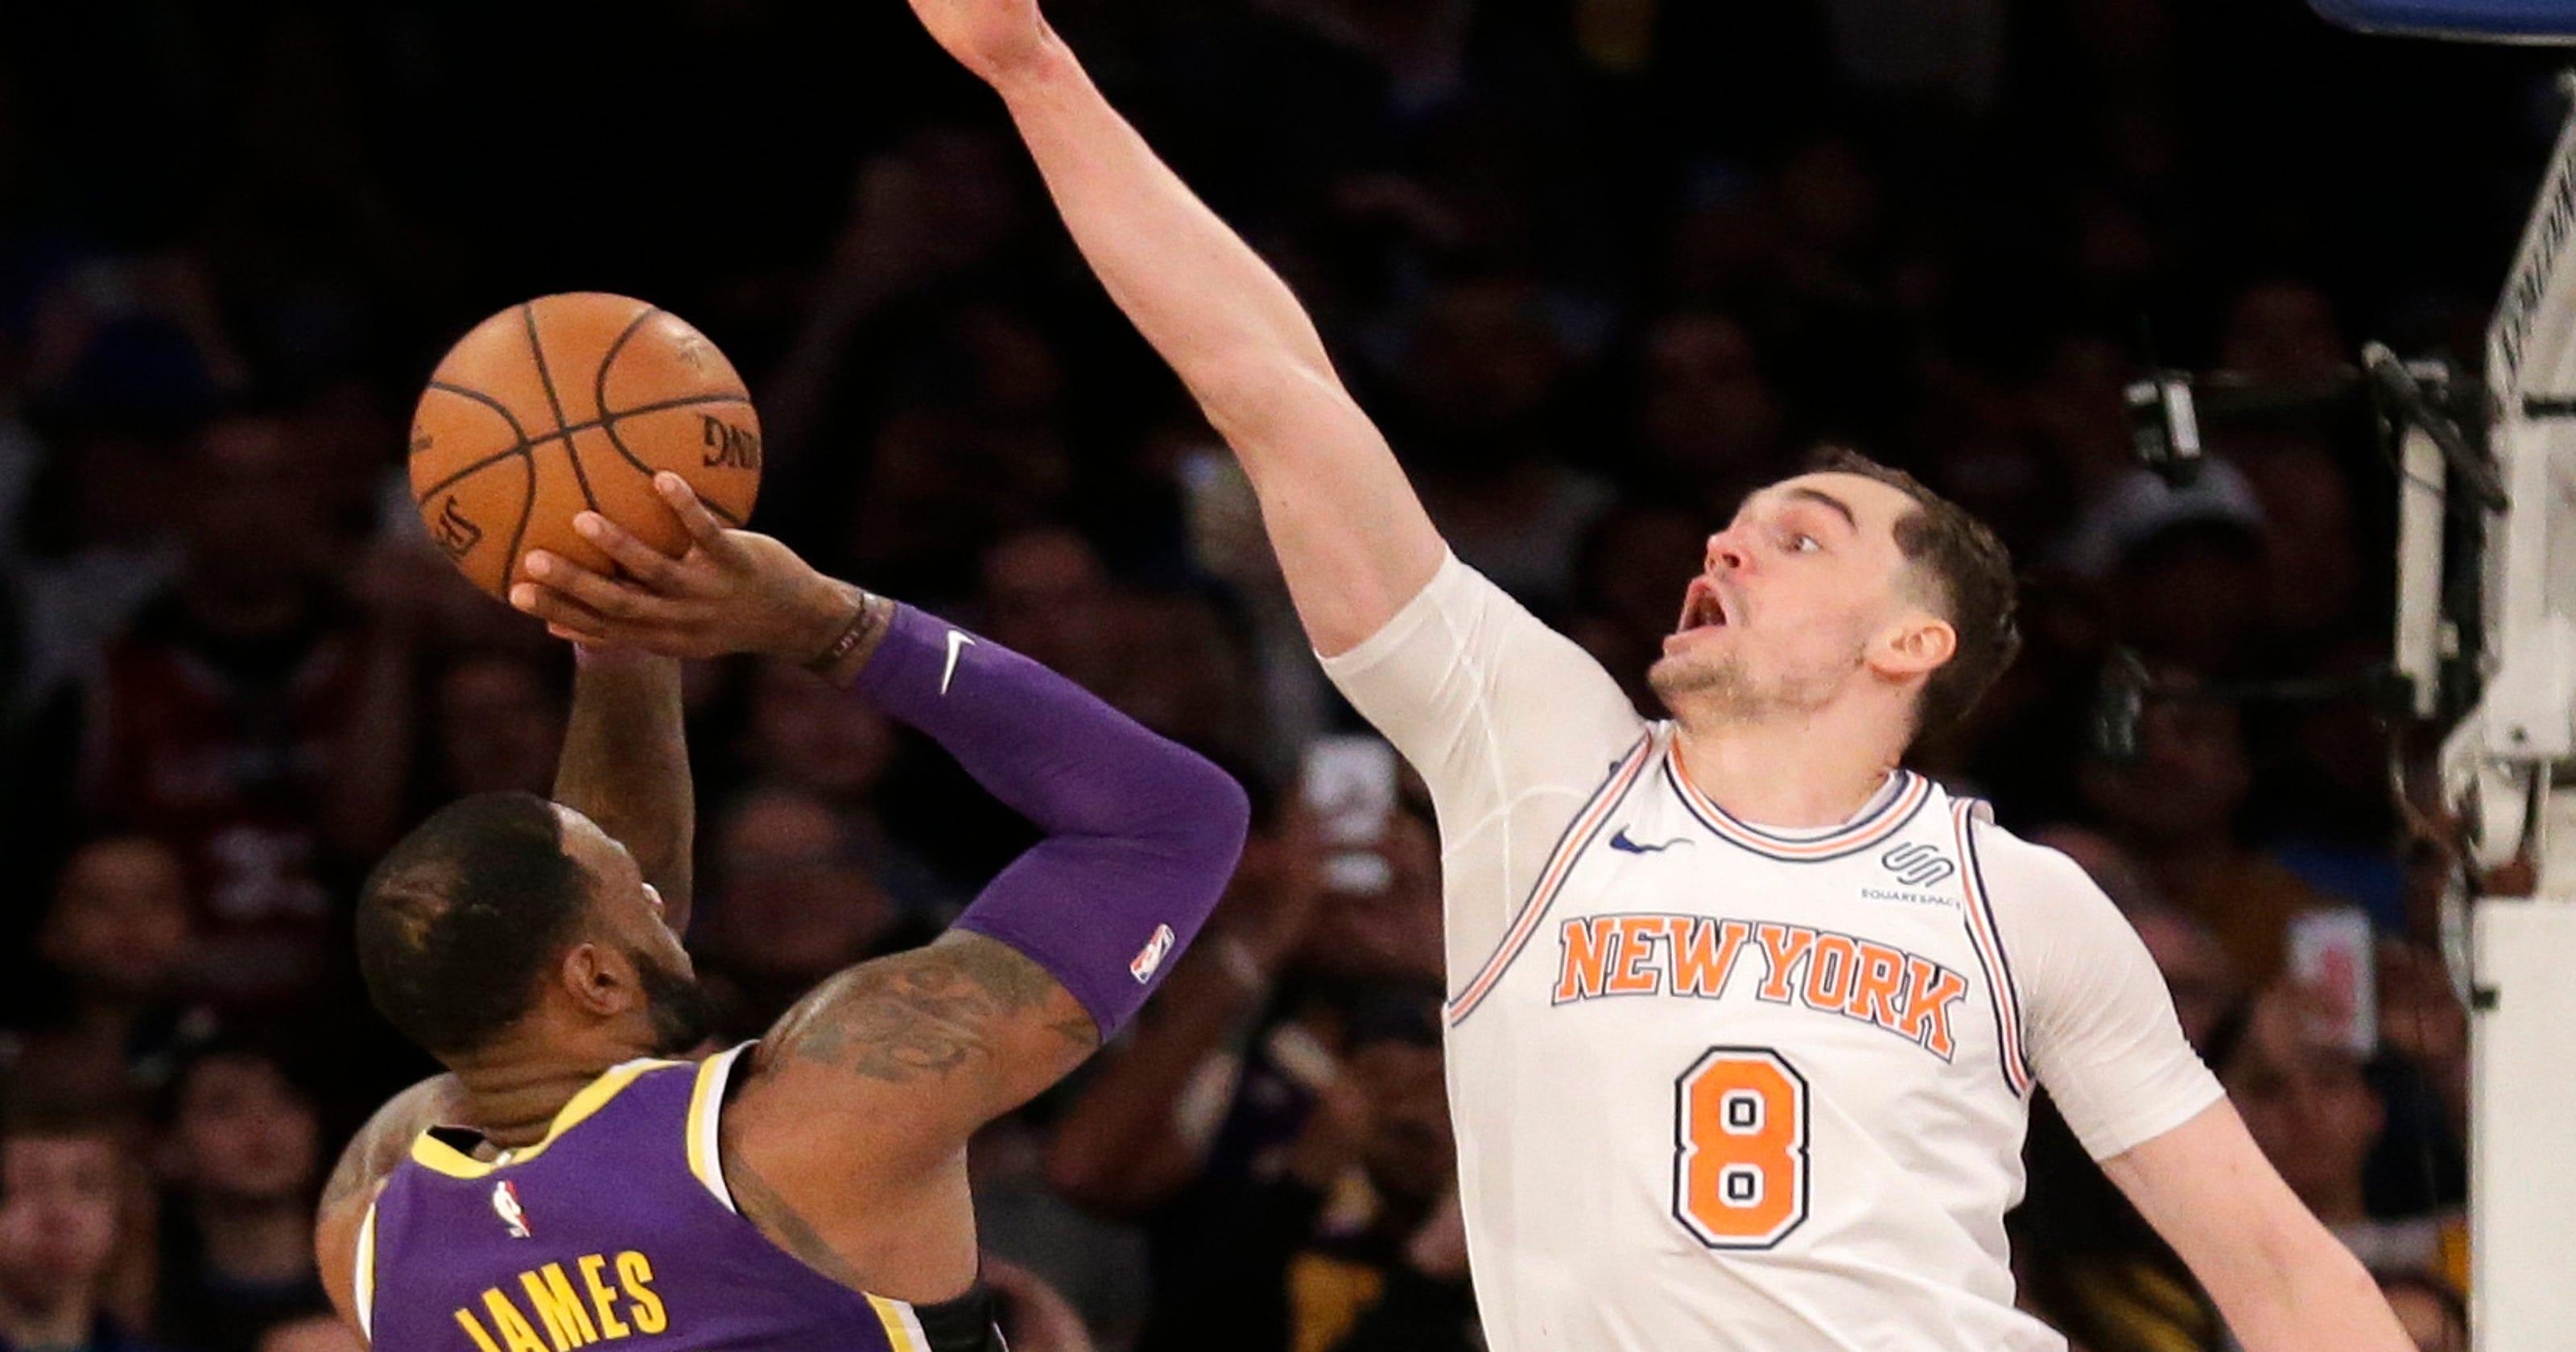 d10c862b3 Mario Hezonja blocks LeBron James  final shot as New York Knicks beat Lakers